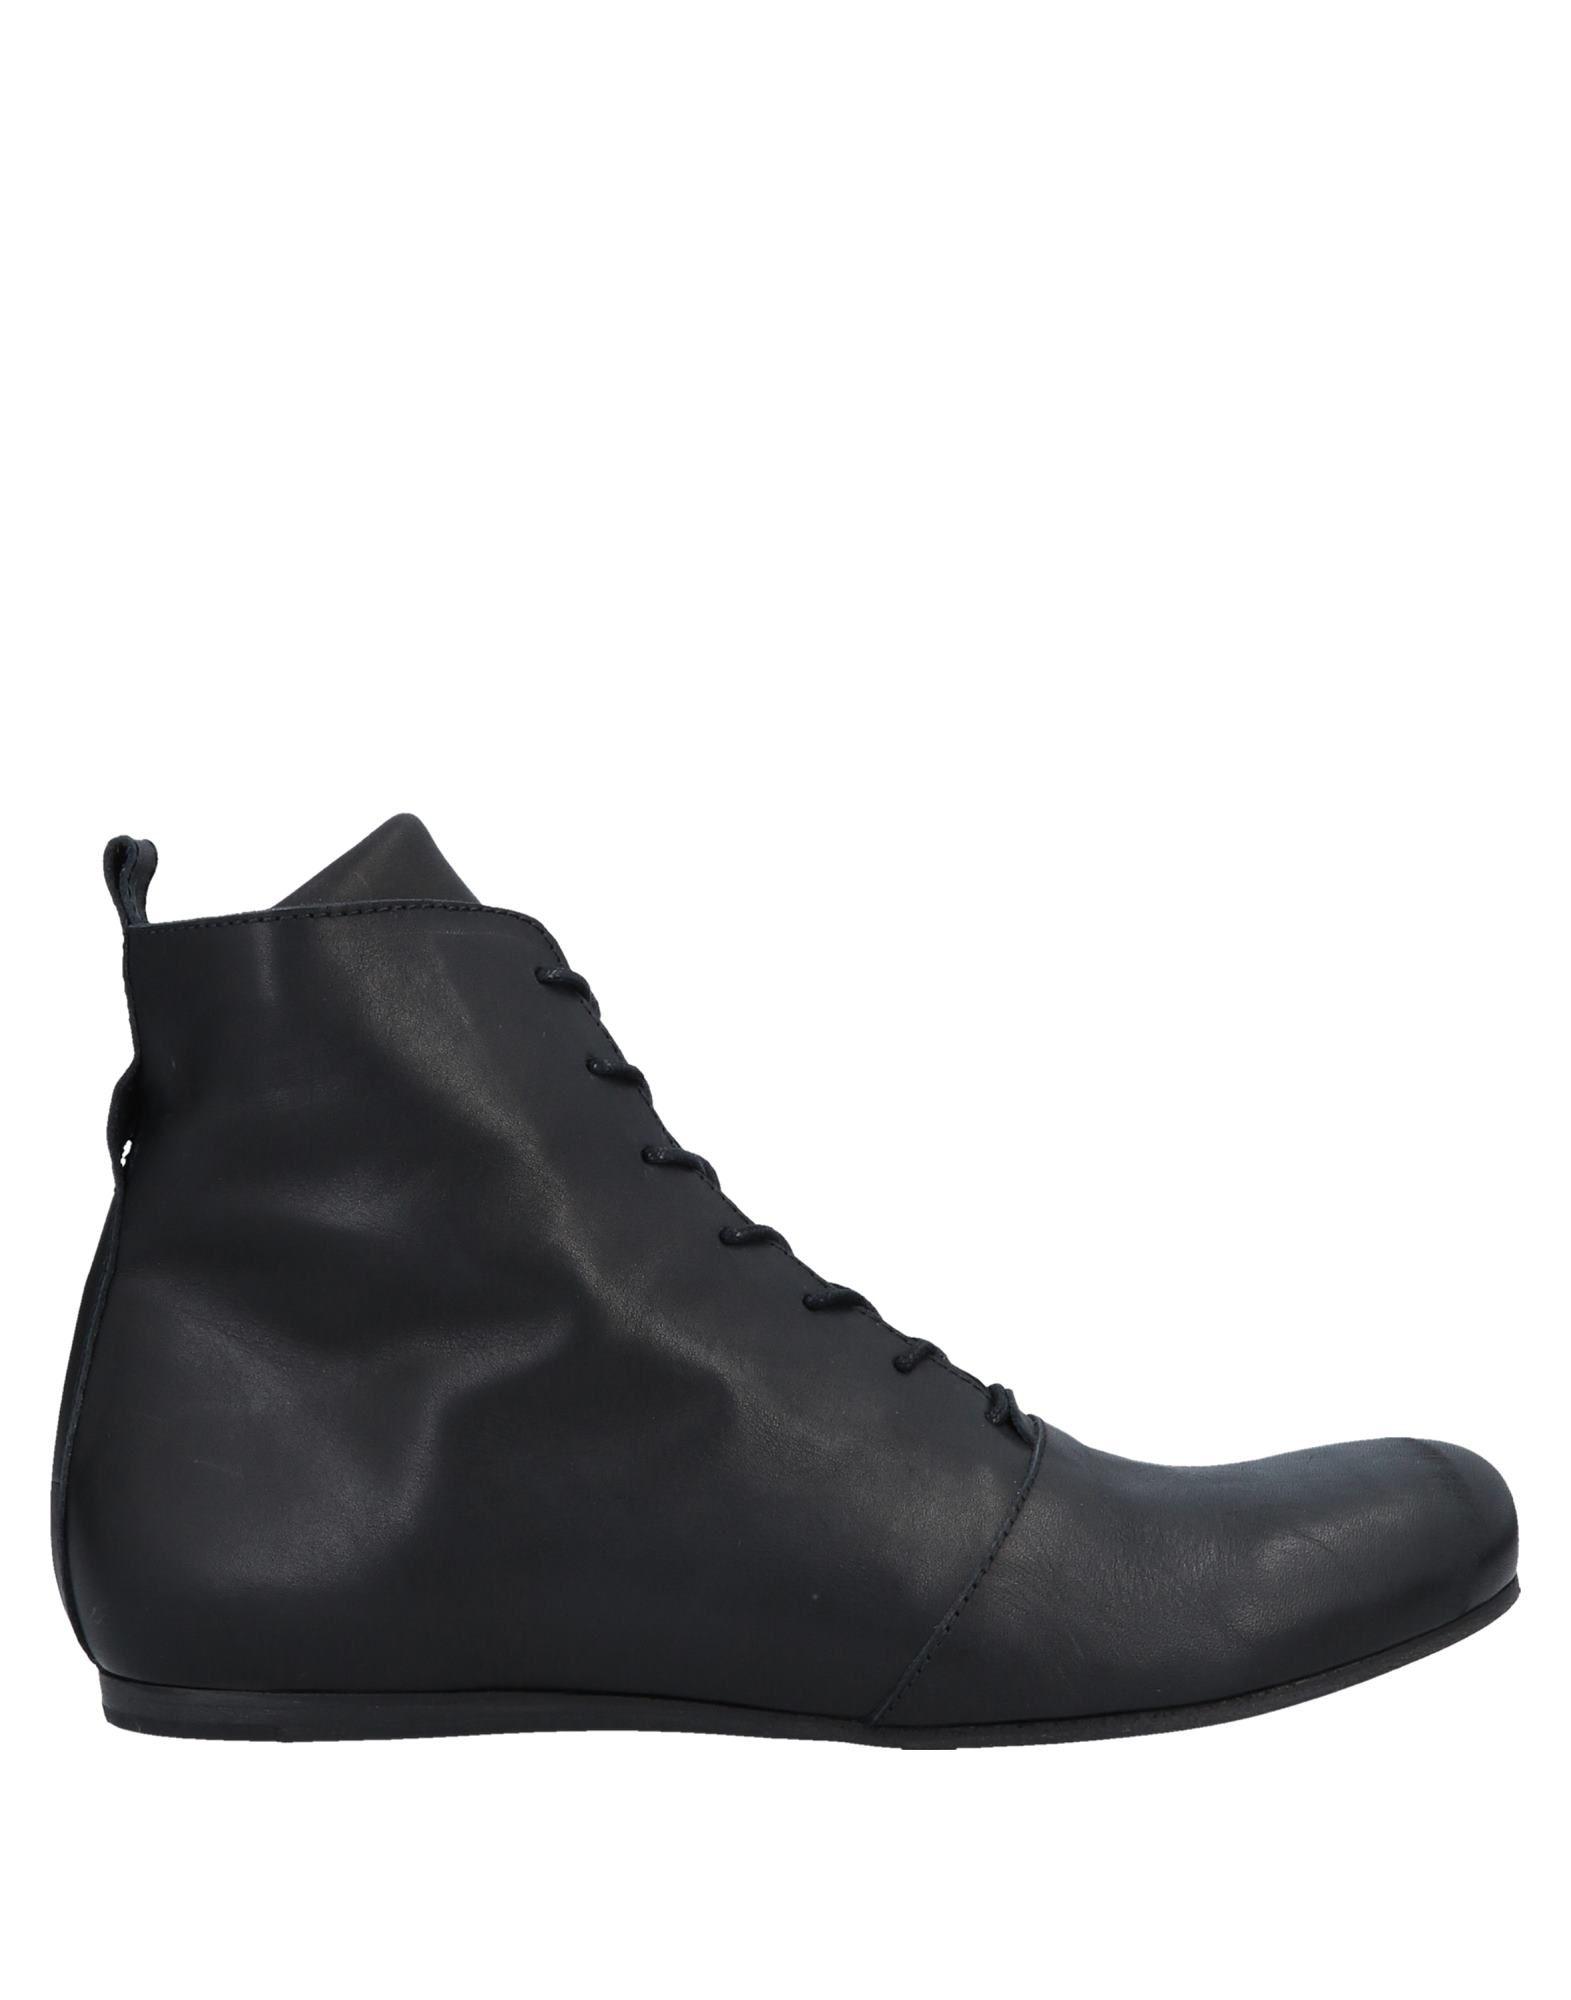 NOSTRASANTISSIMA Полусапоги и высокие ботинки ботинки swims ботинки без каблука